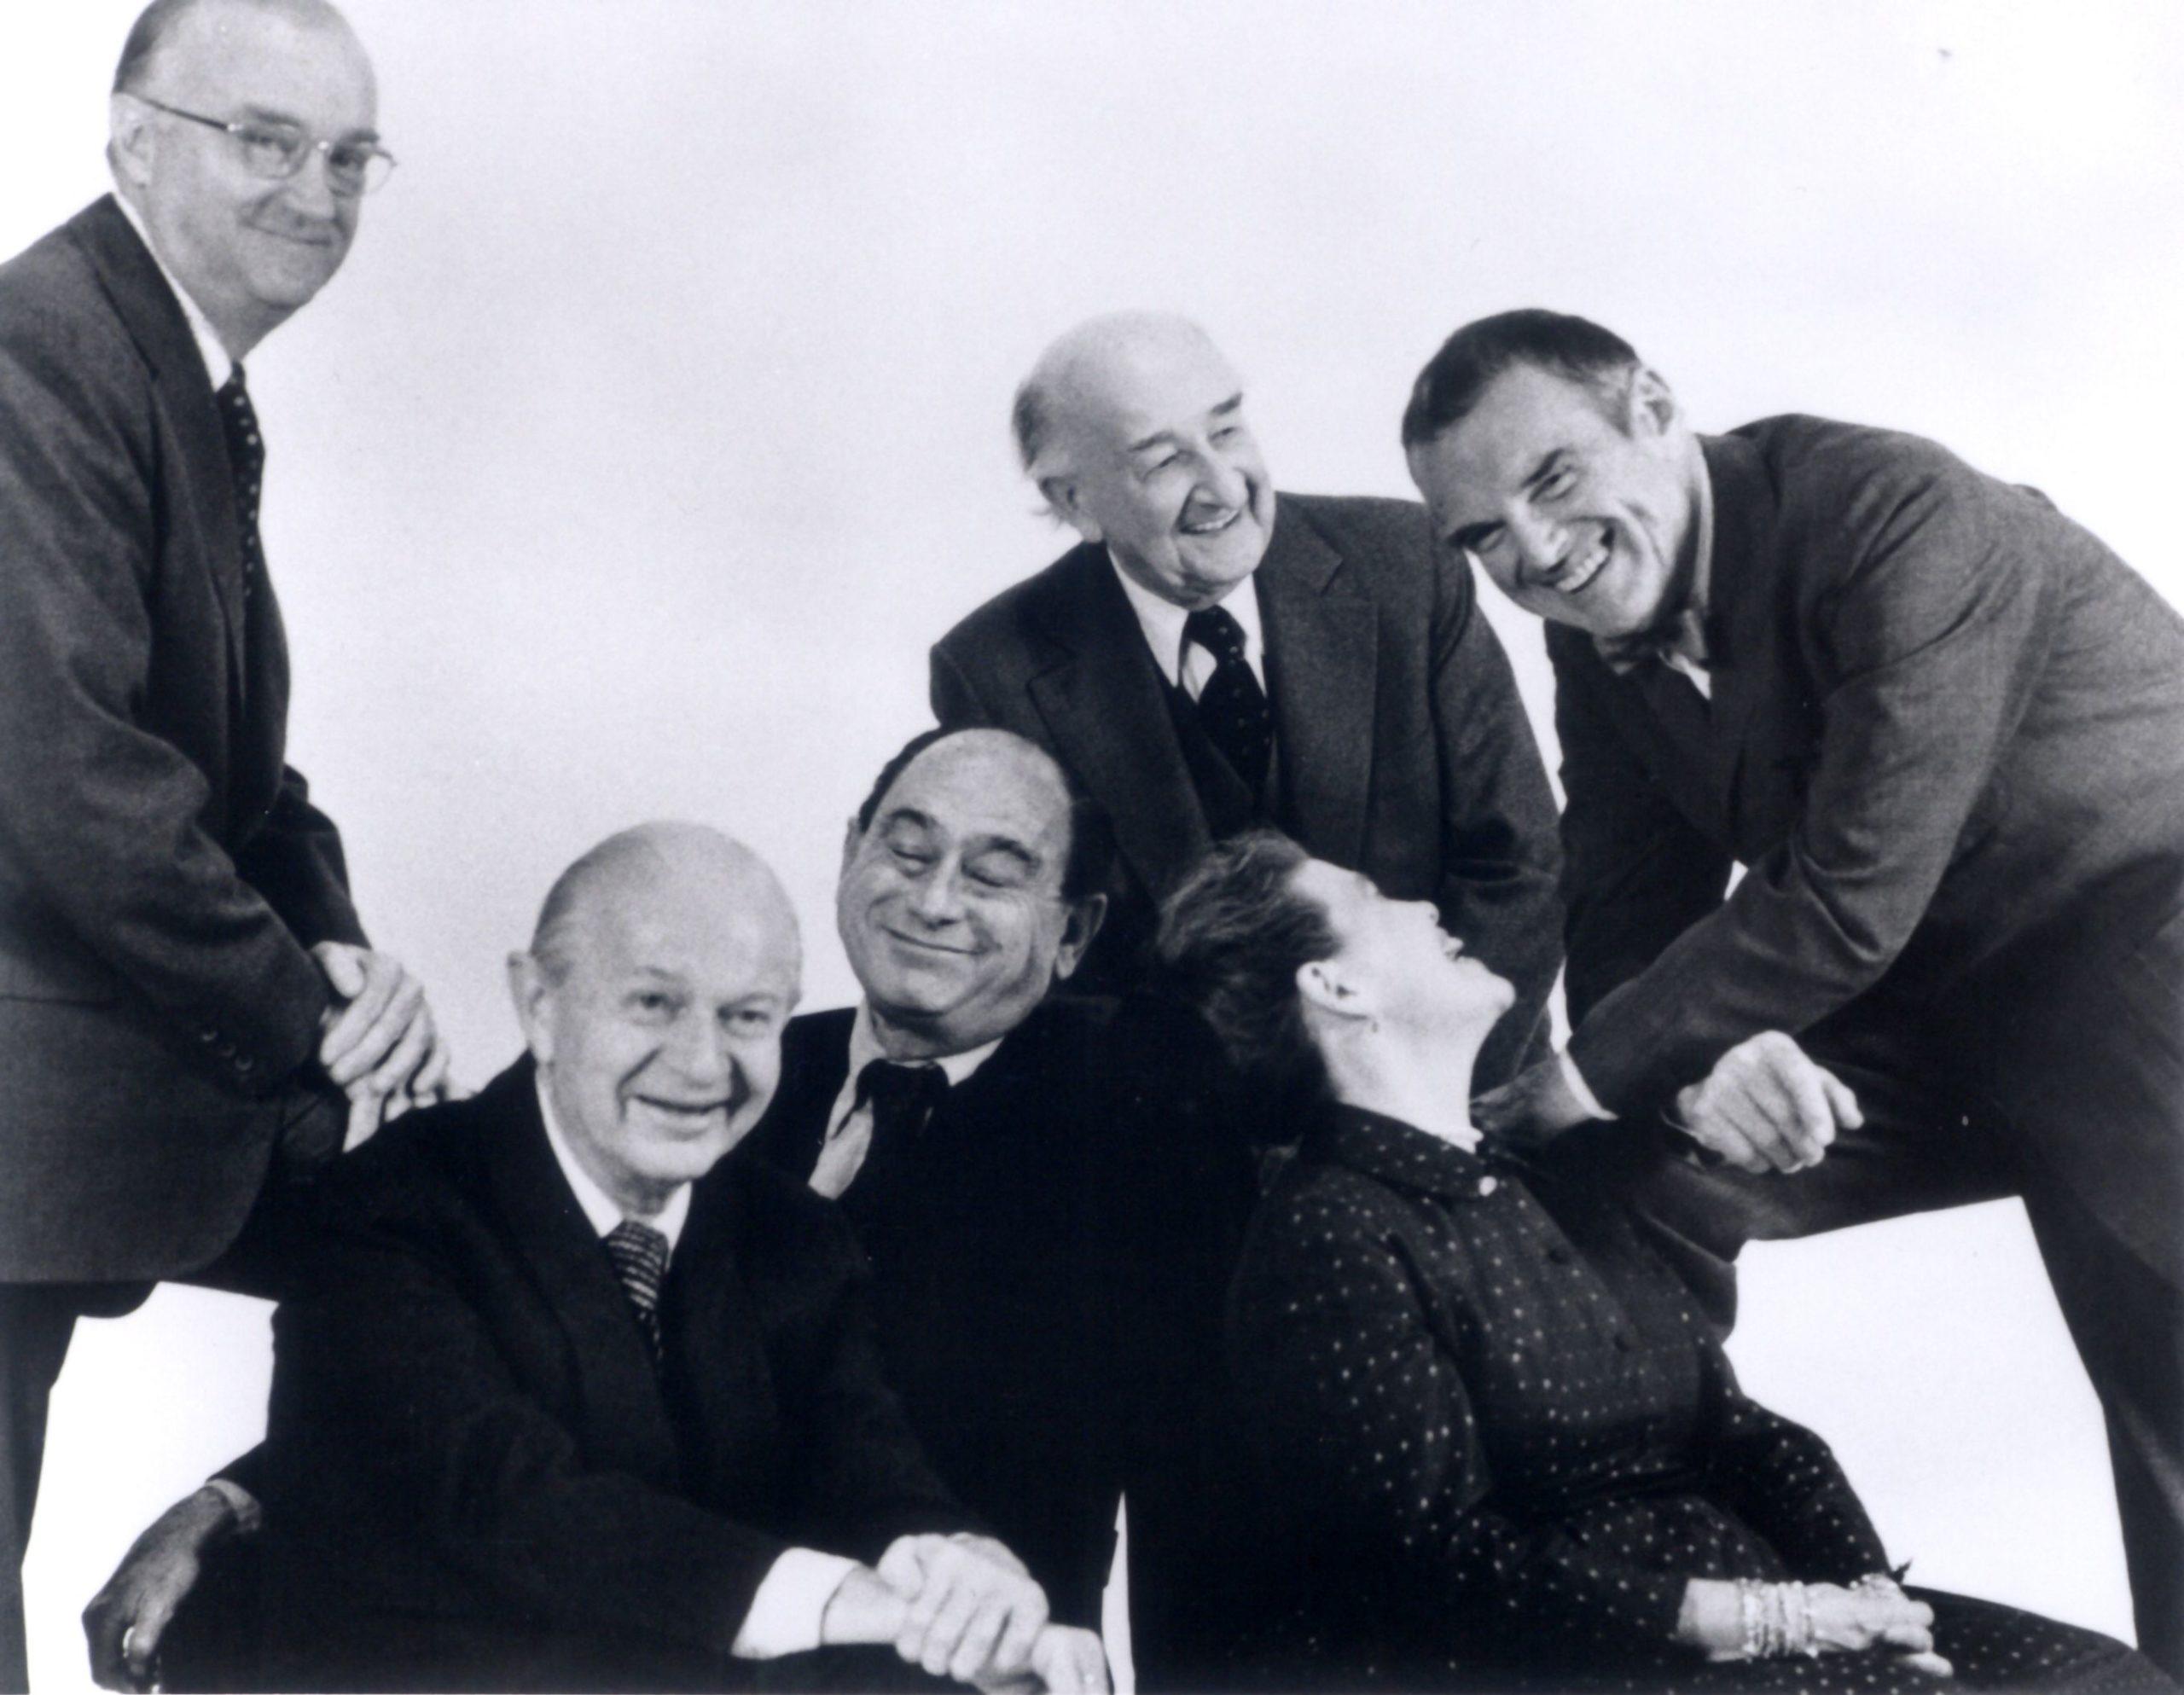 Robert Probst, Alexander Girard, George Nelson, DJ De Pree, Charles y Ray Eames.